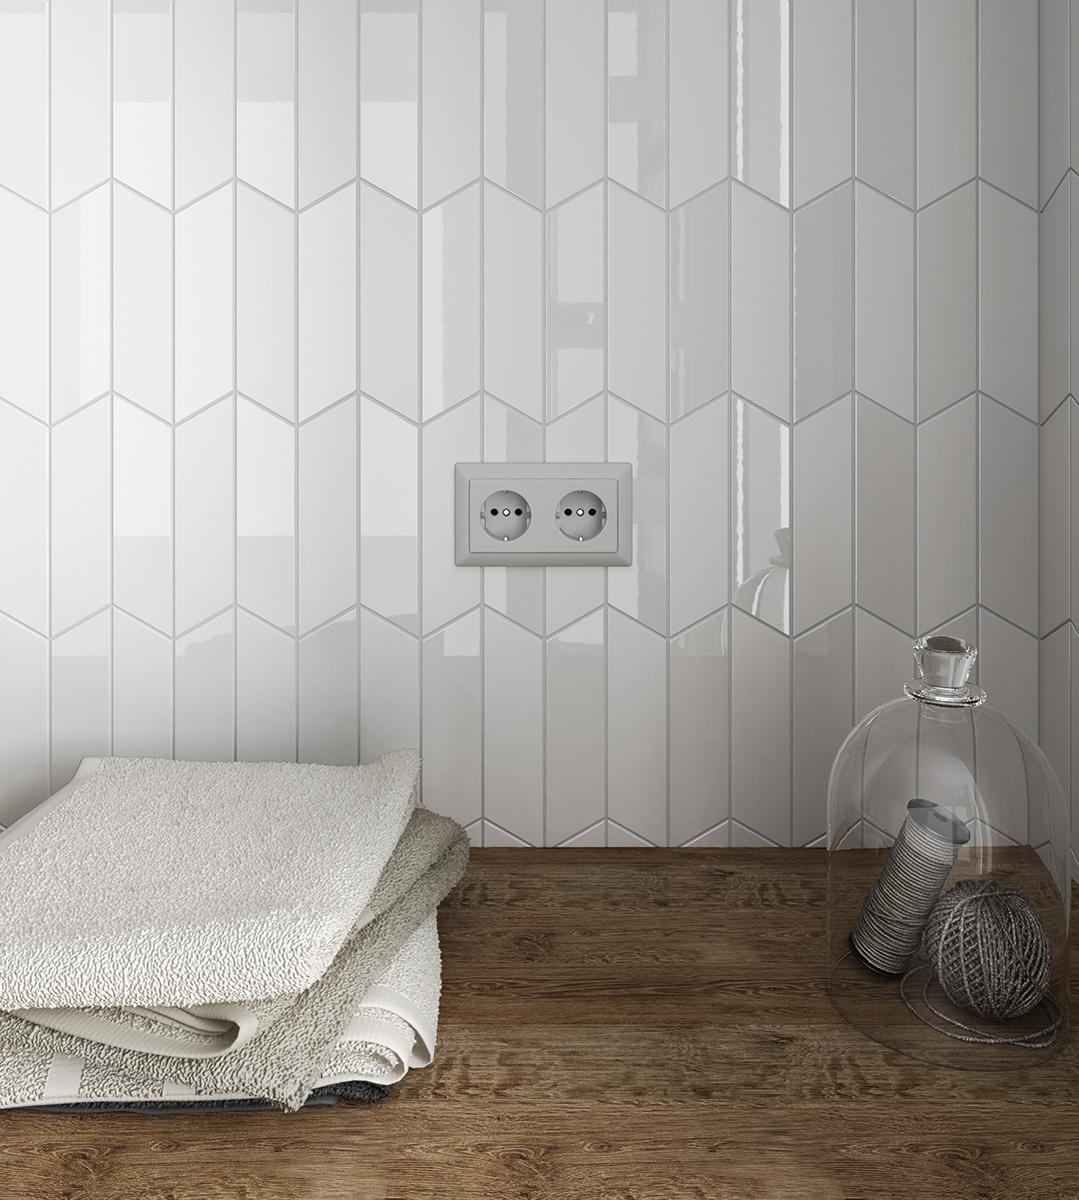 Hexagon Mosaic Tile Backsplash